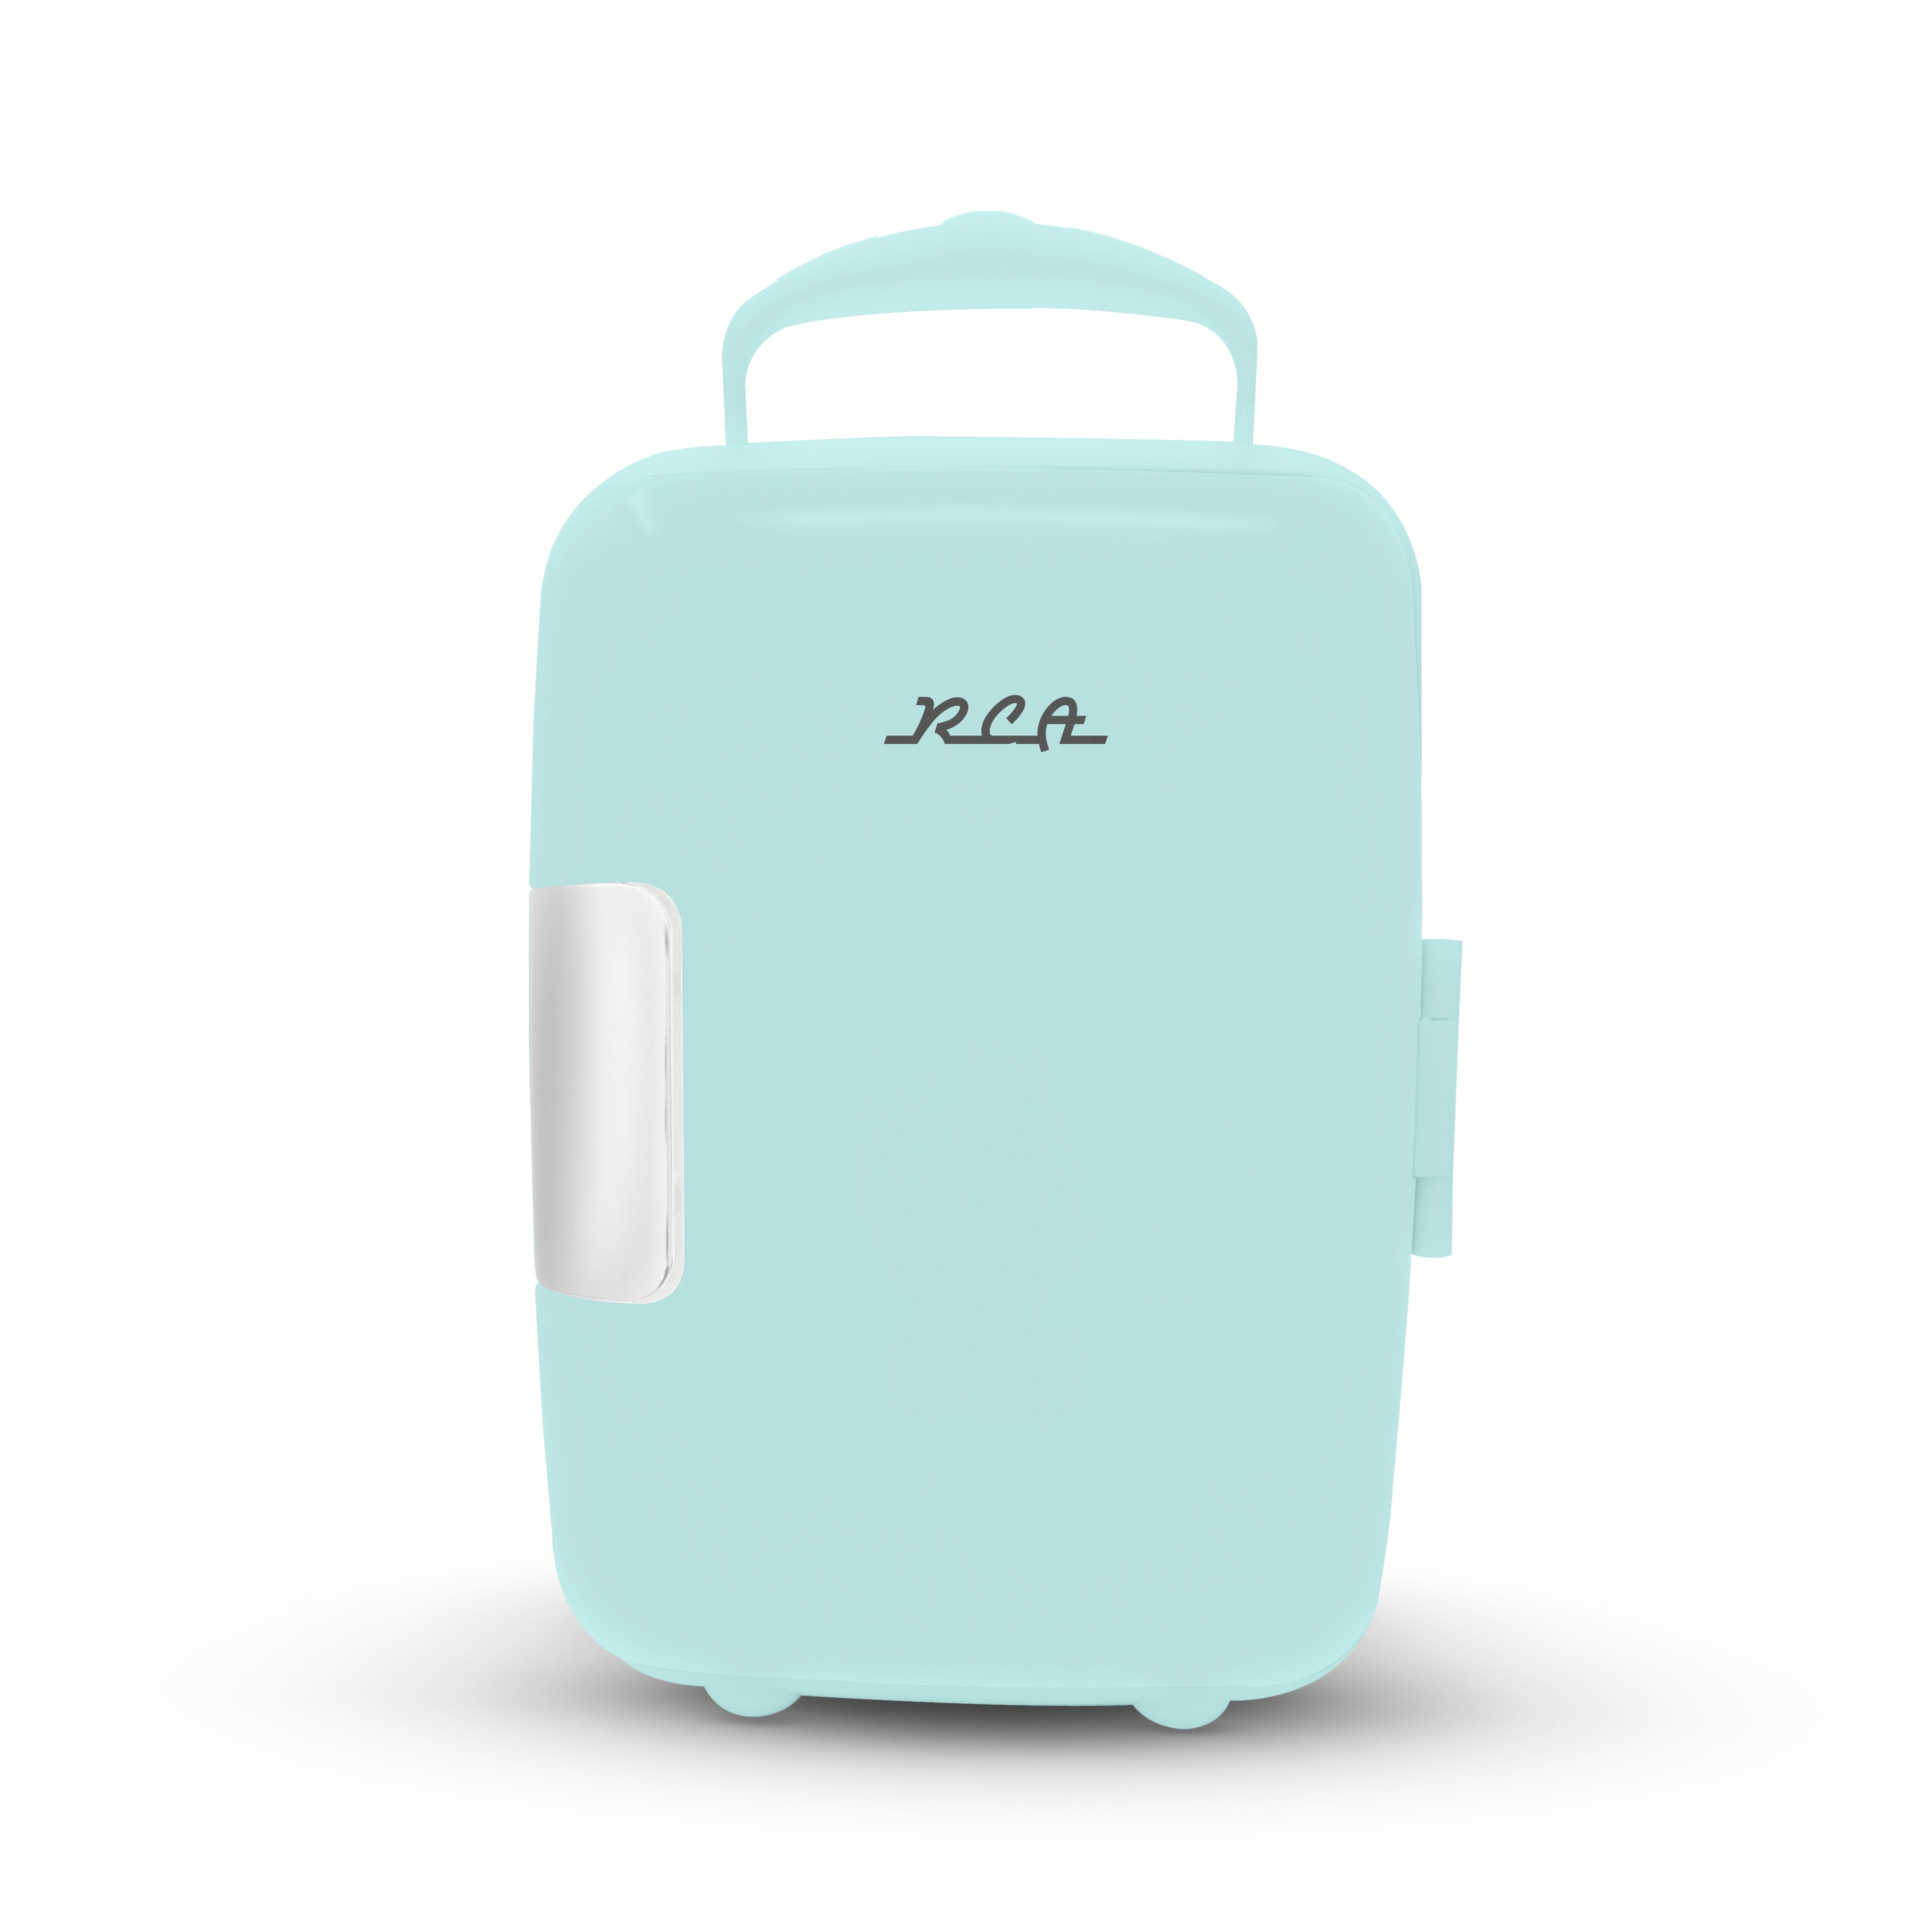 Mini refrigerador RCA en menta